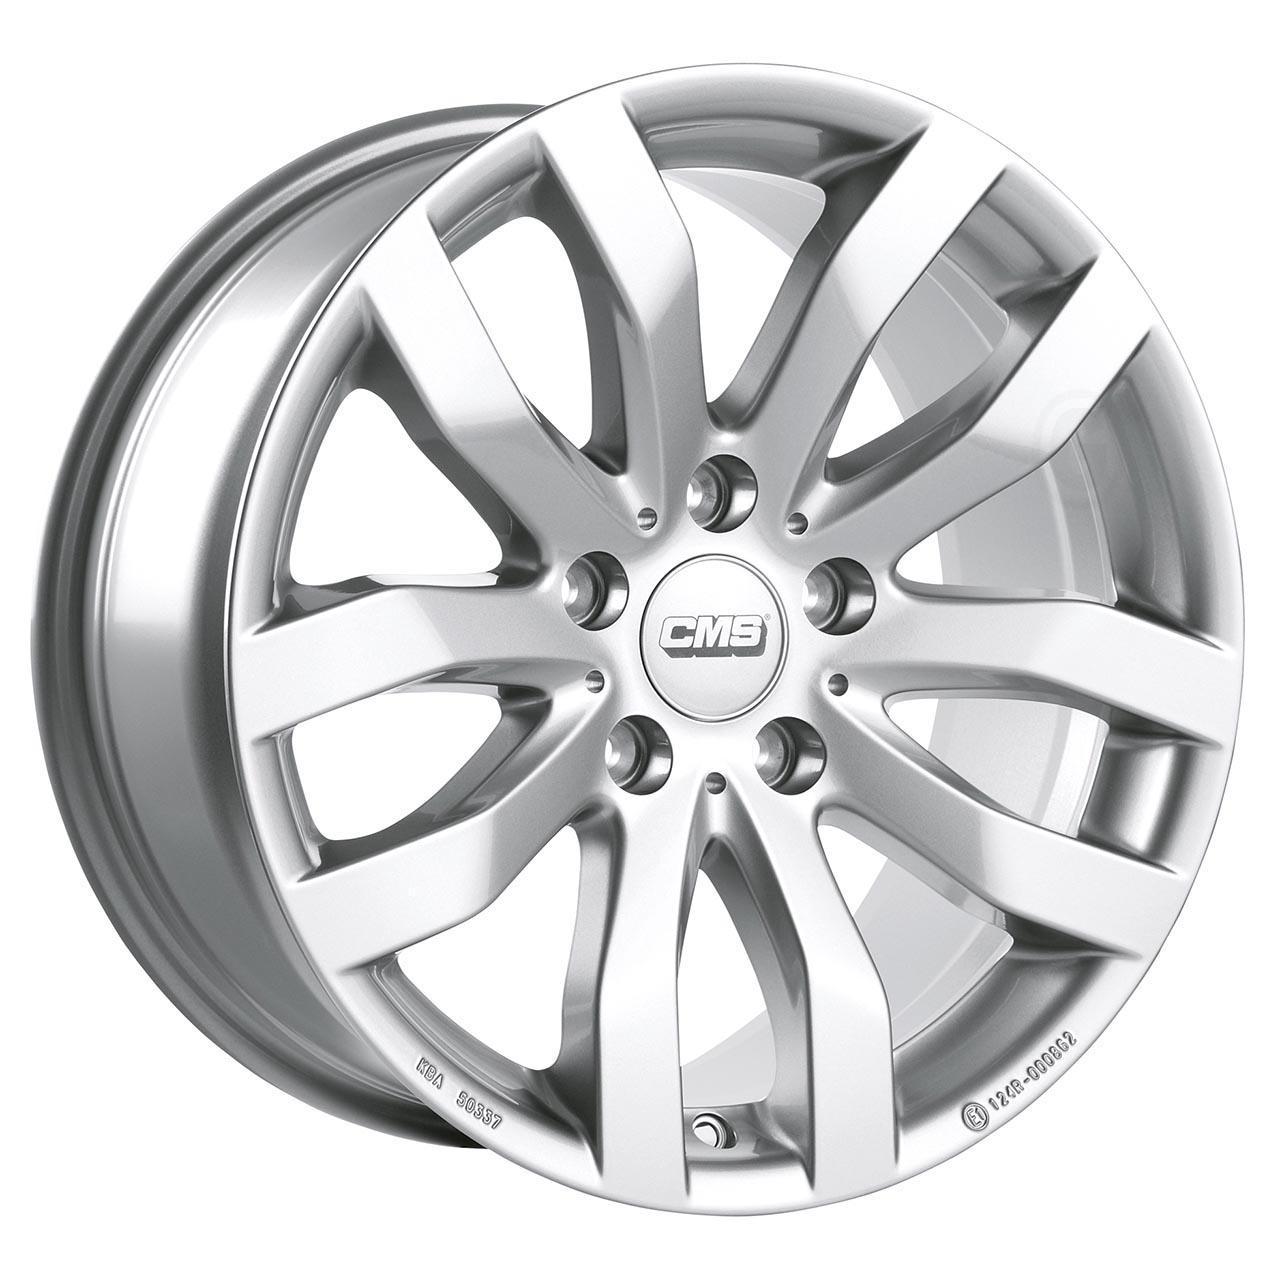 CMS C22 Racing silver 6.5x16 5x114.3 ET40